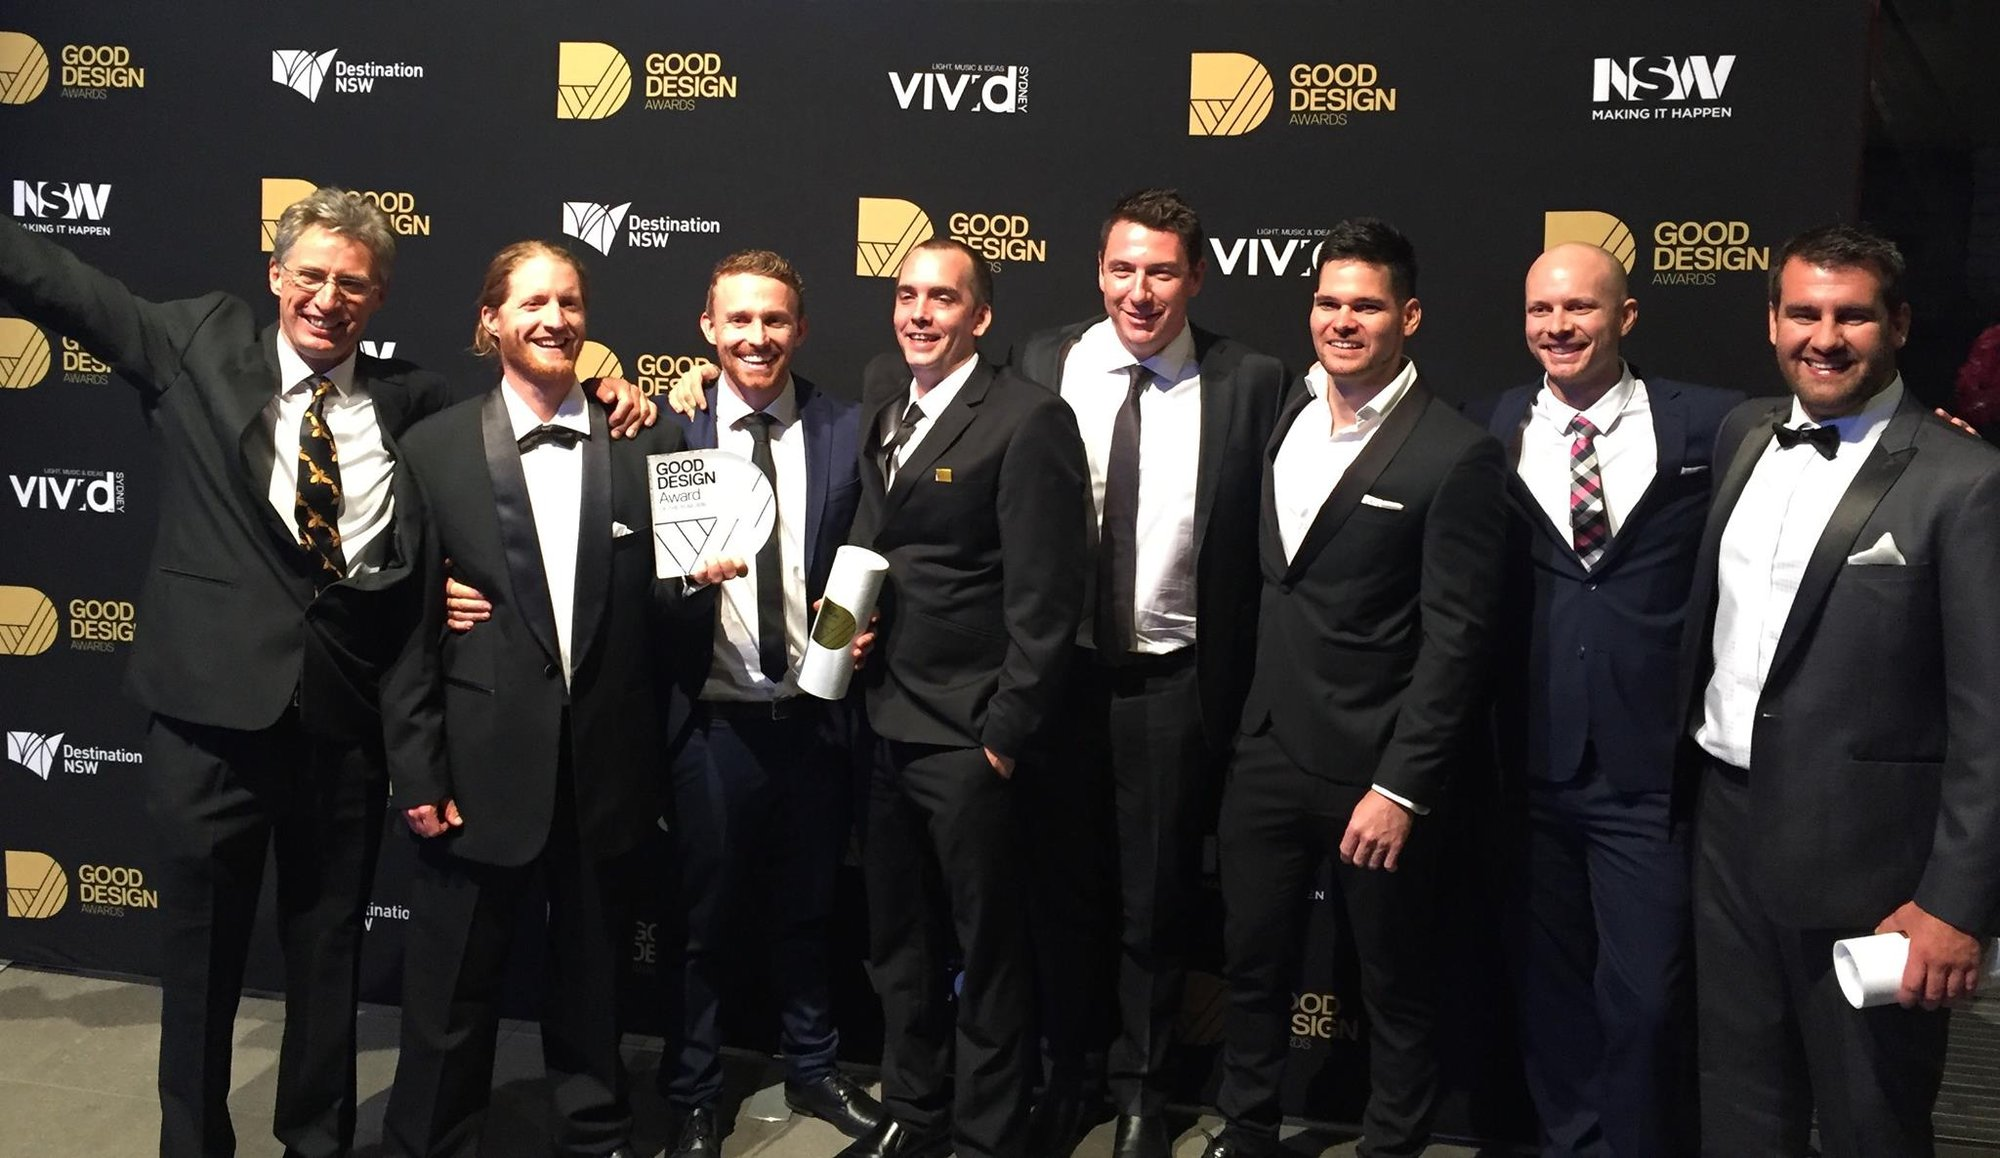 Image credit: Evolve Group (http://www.evolvegrp.com/news/evolve-group-wins-2016-good-design-award-of-the-year)